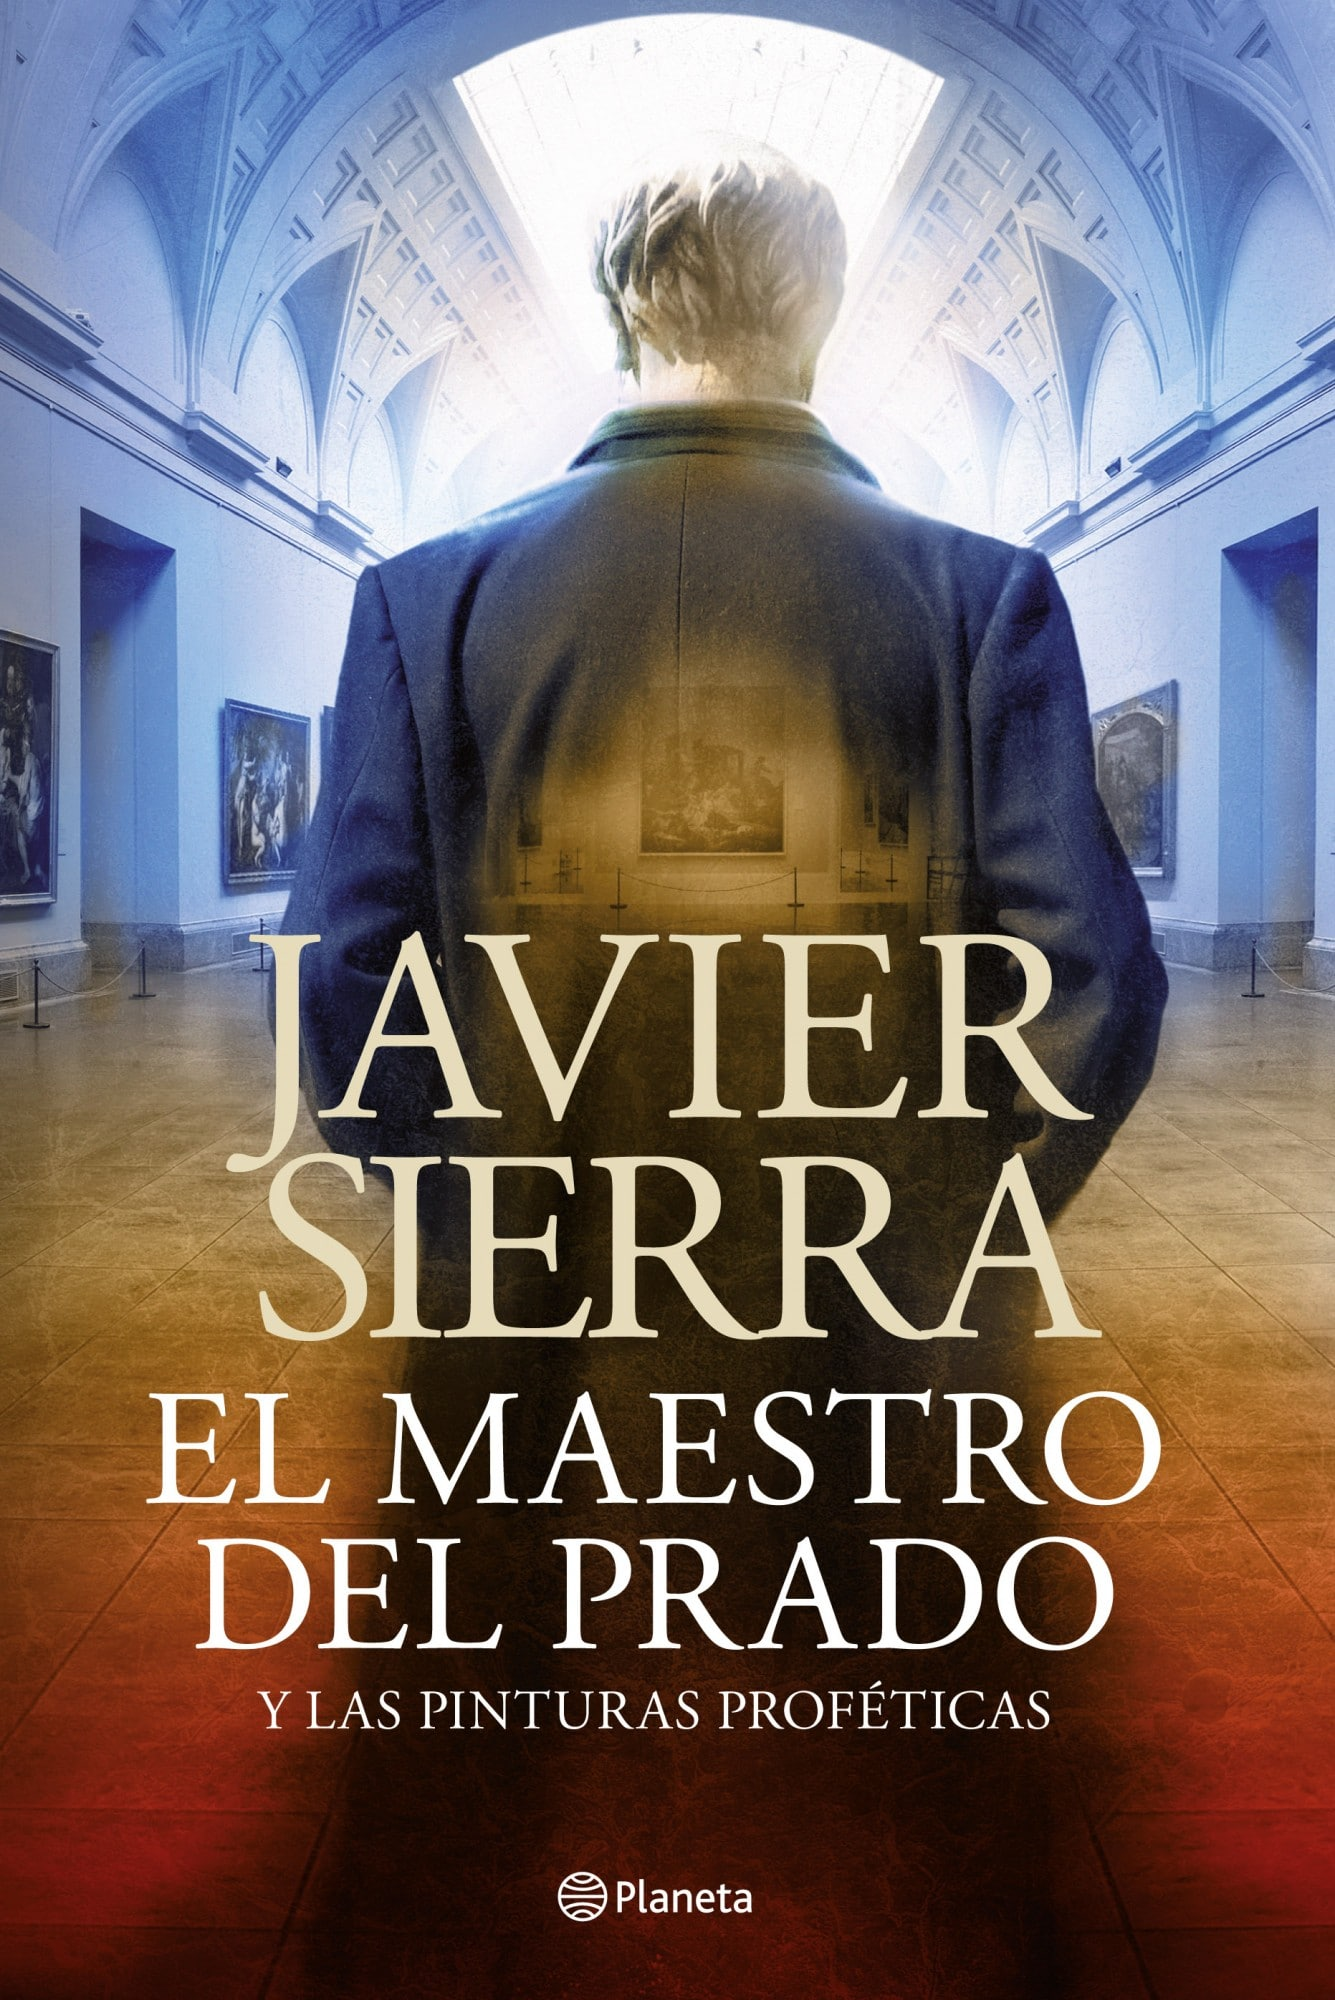 Libros más vendidos en España en abril 2013